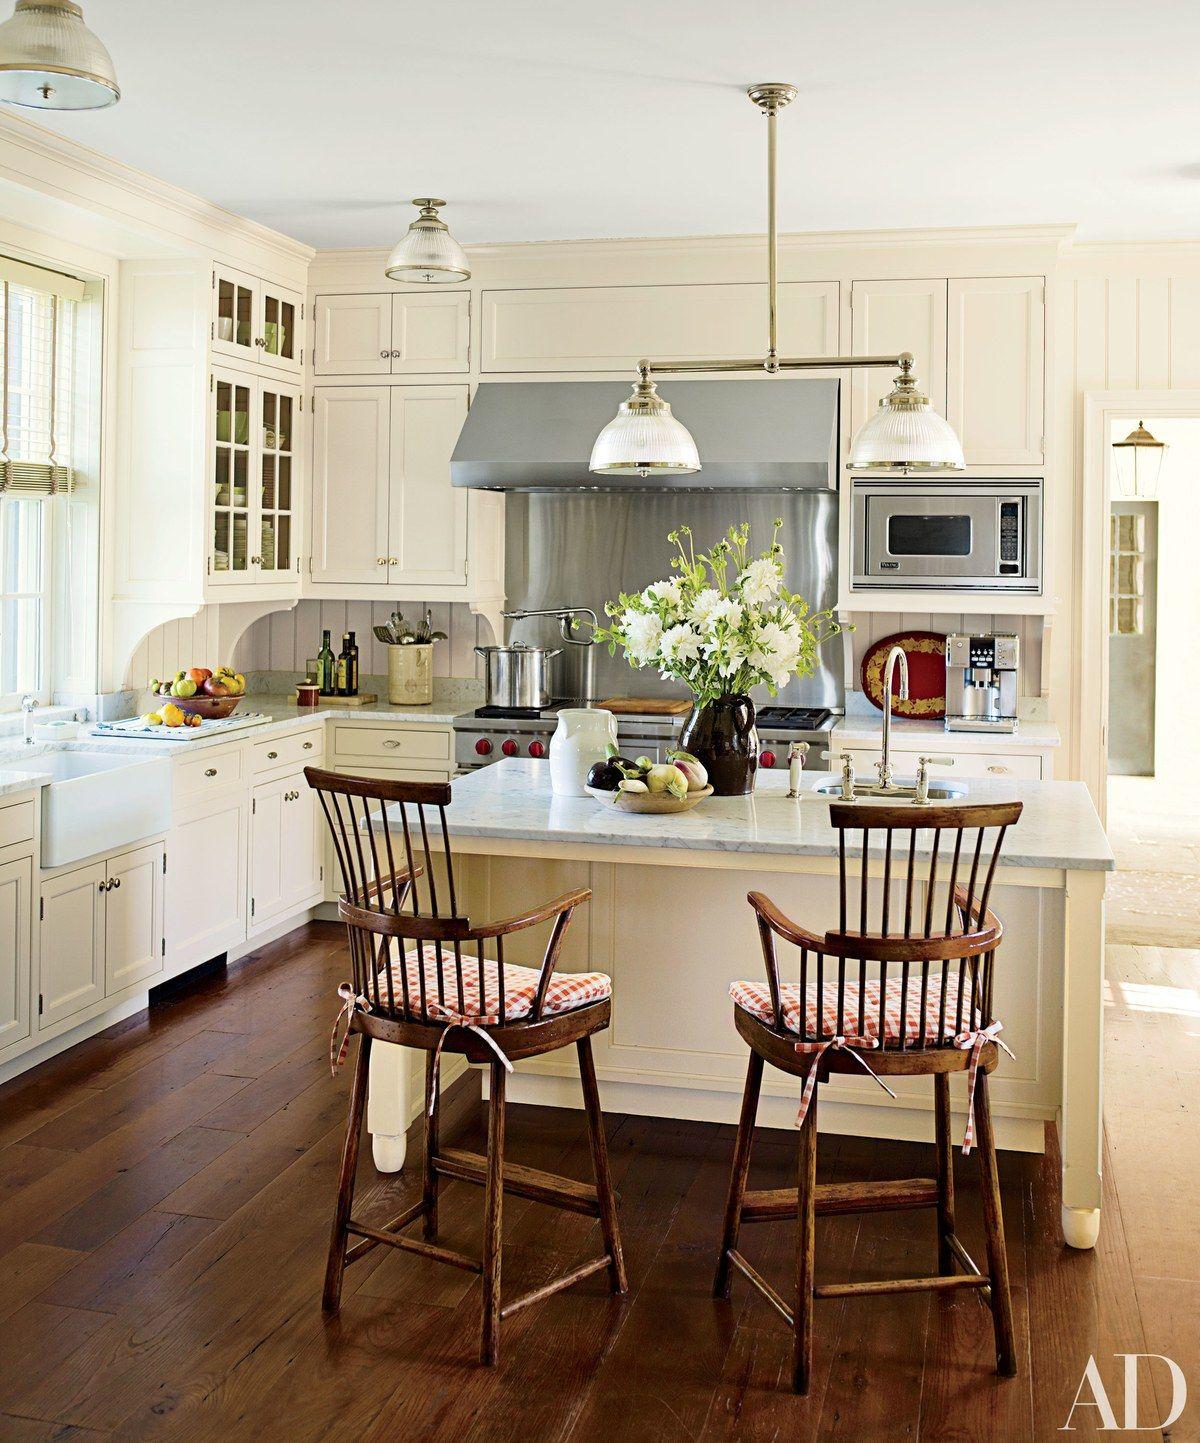 Period Kitchens Designs Renovation: 19 Inspiring Farmhouse Kitchen Sink Ideas